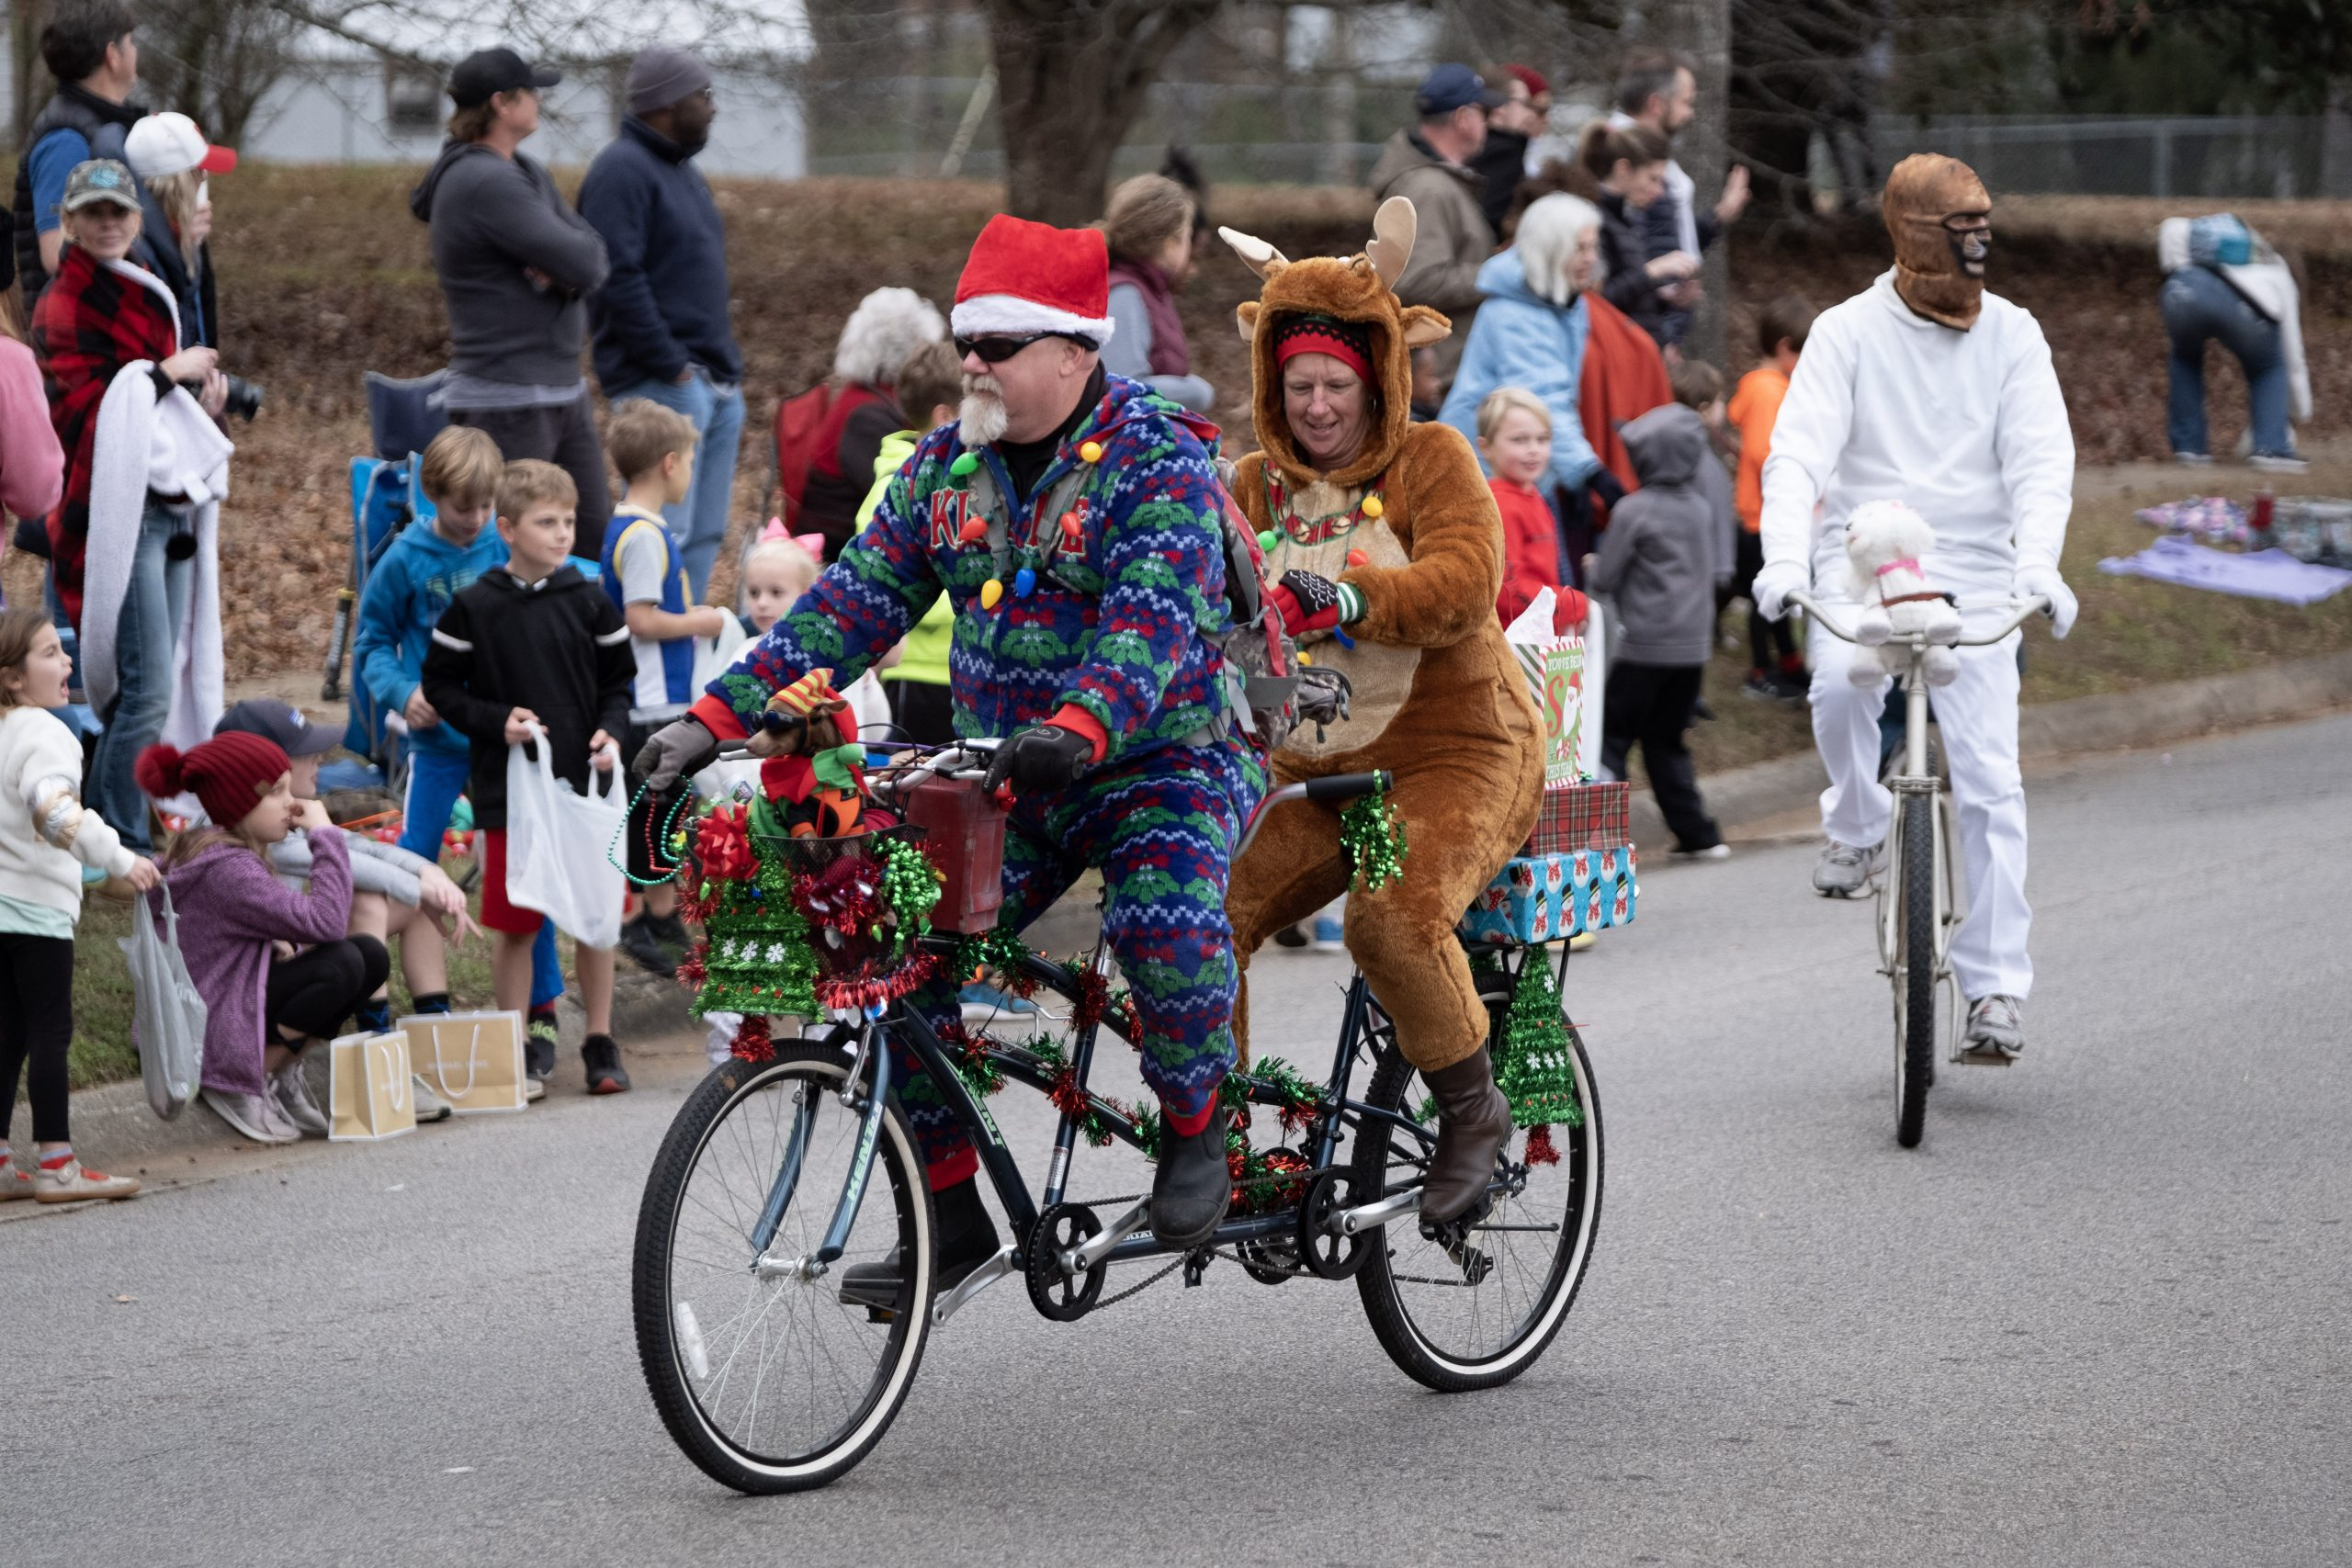 Argo votes in favor of Christmas parade amid coronavirus